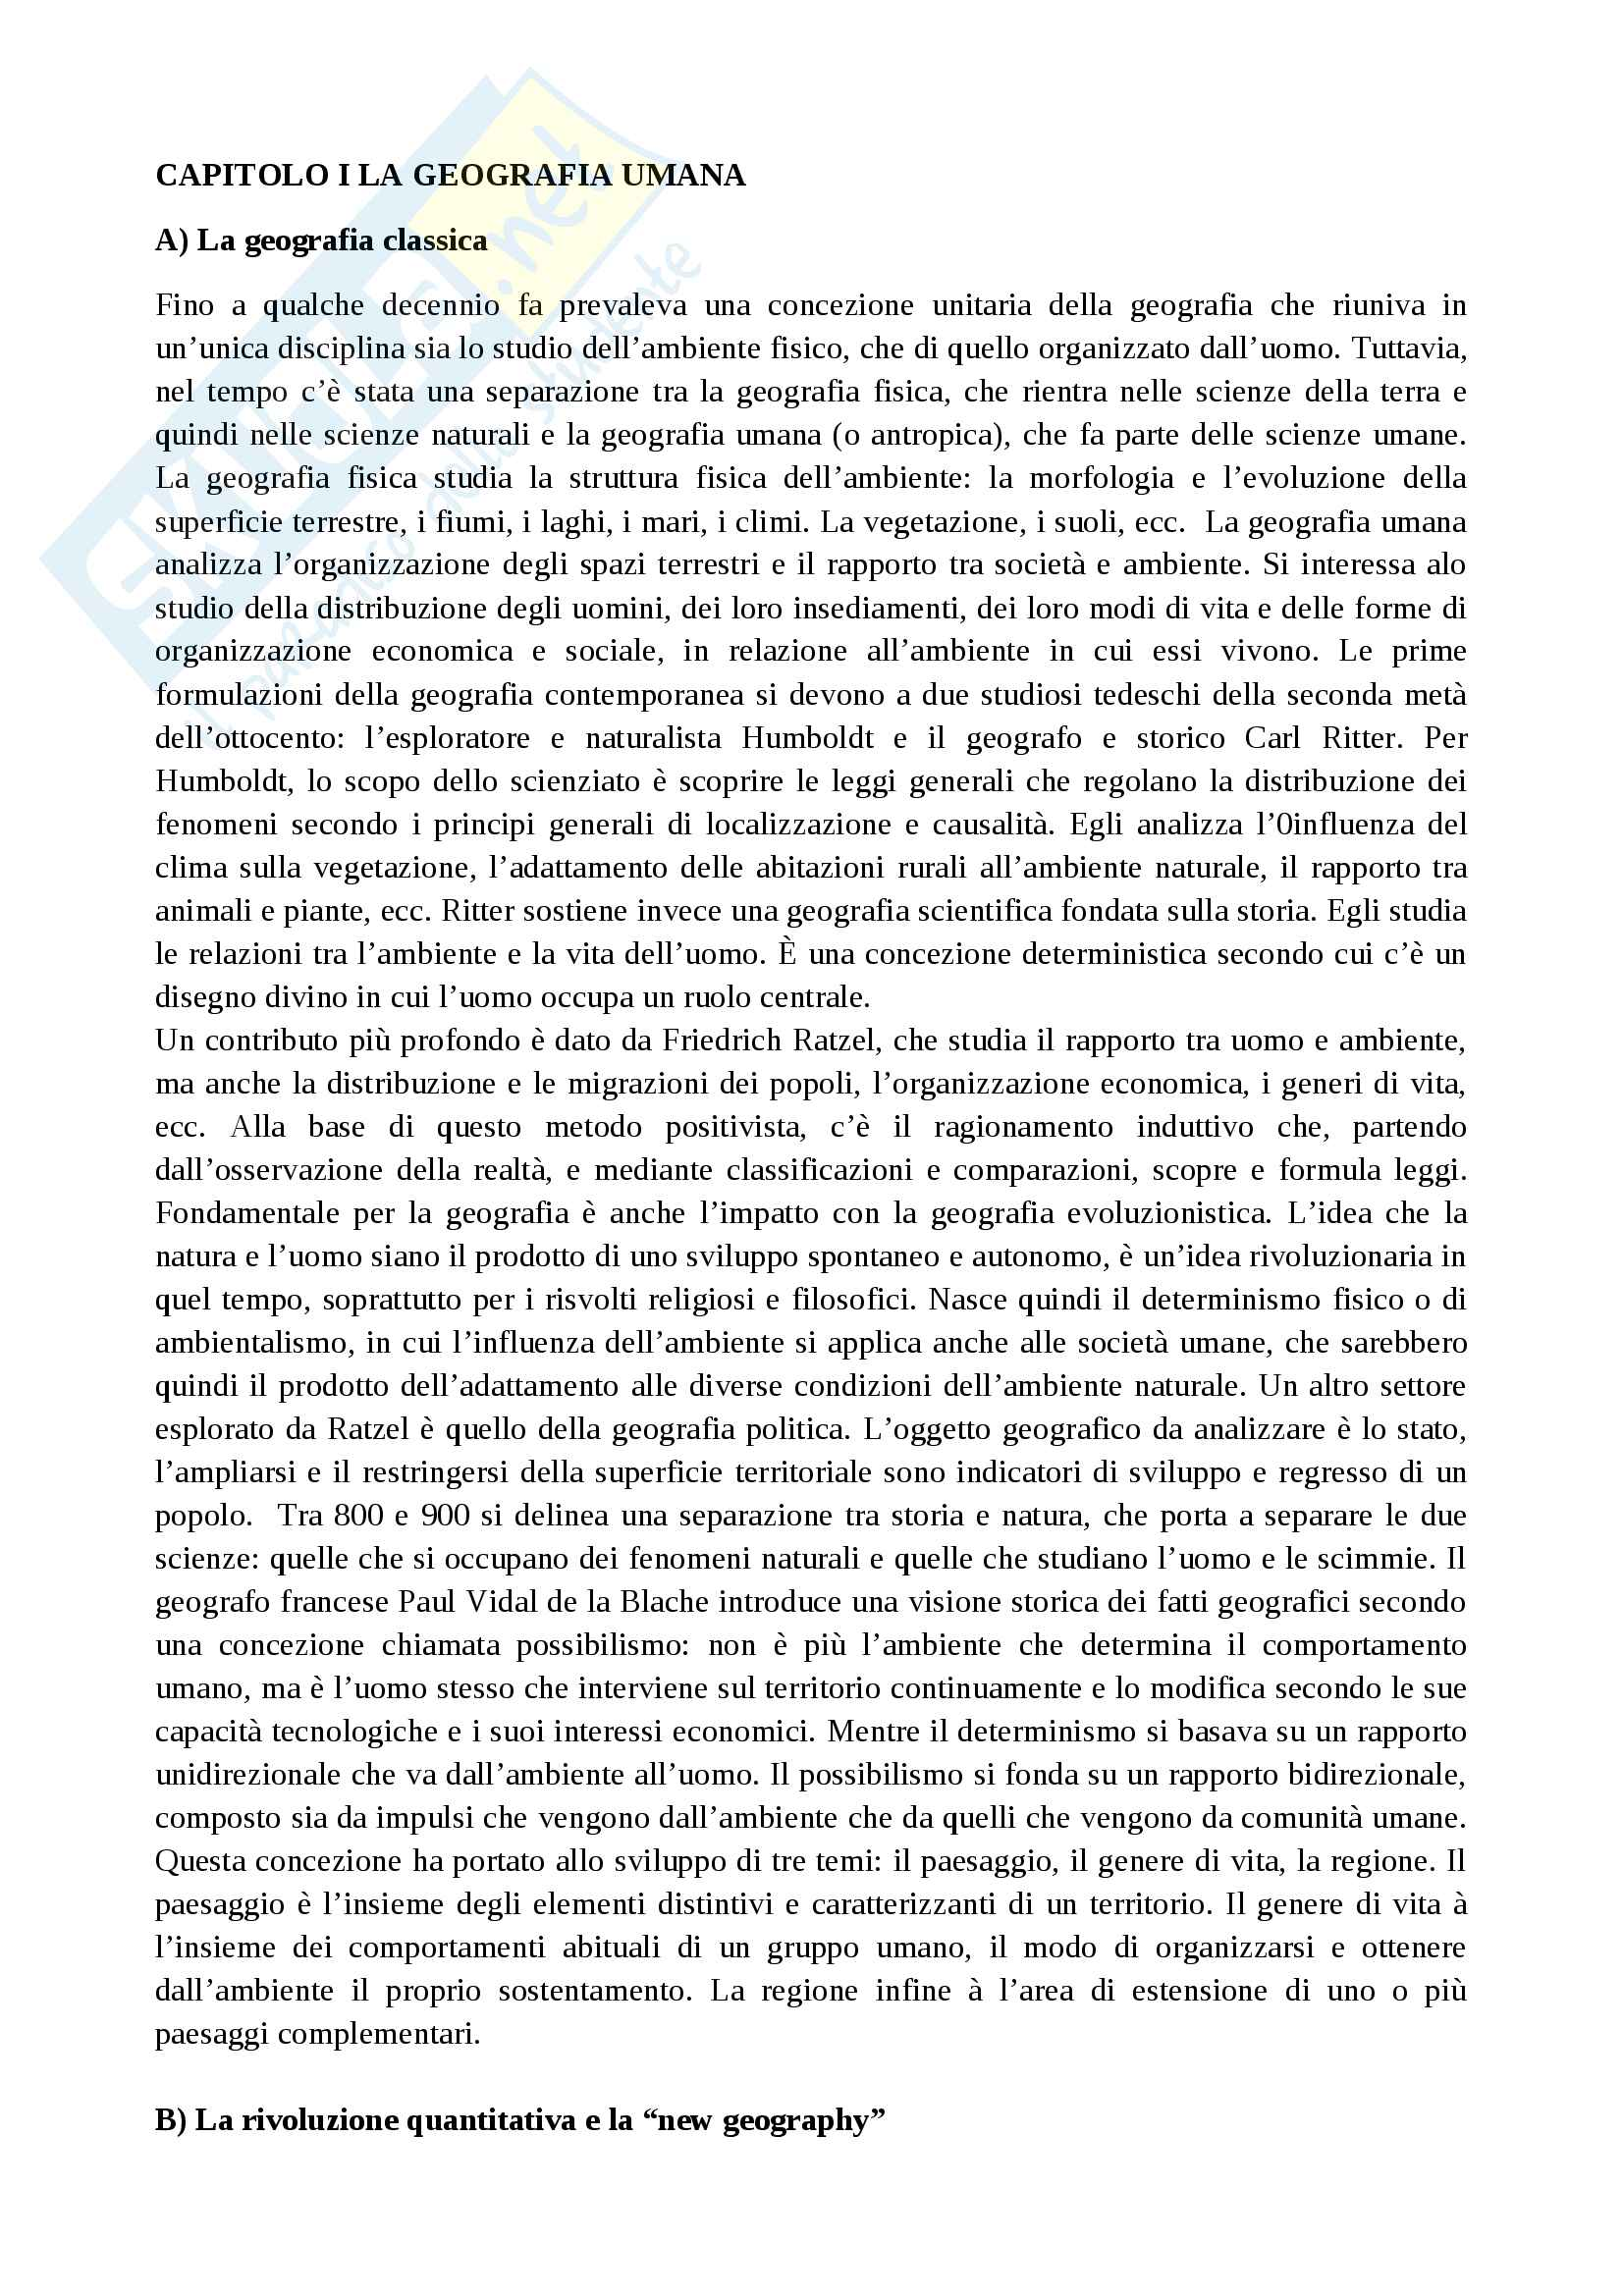 Riassunto esame Geografia umana, prof. Maury, libro consigliato Compendio di geografia umana, Dagradi-Cencini